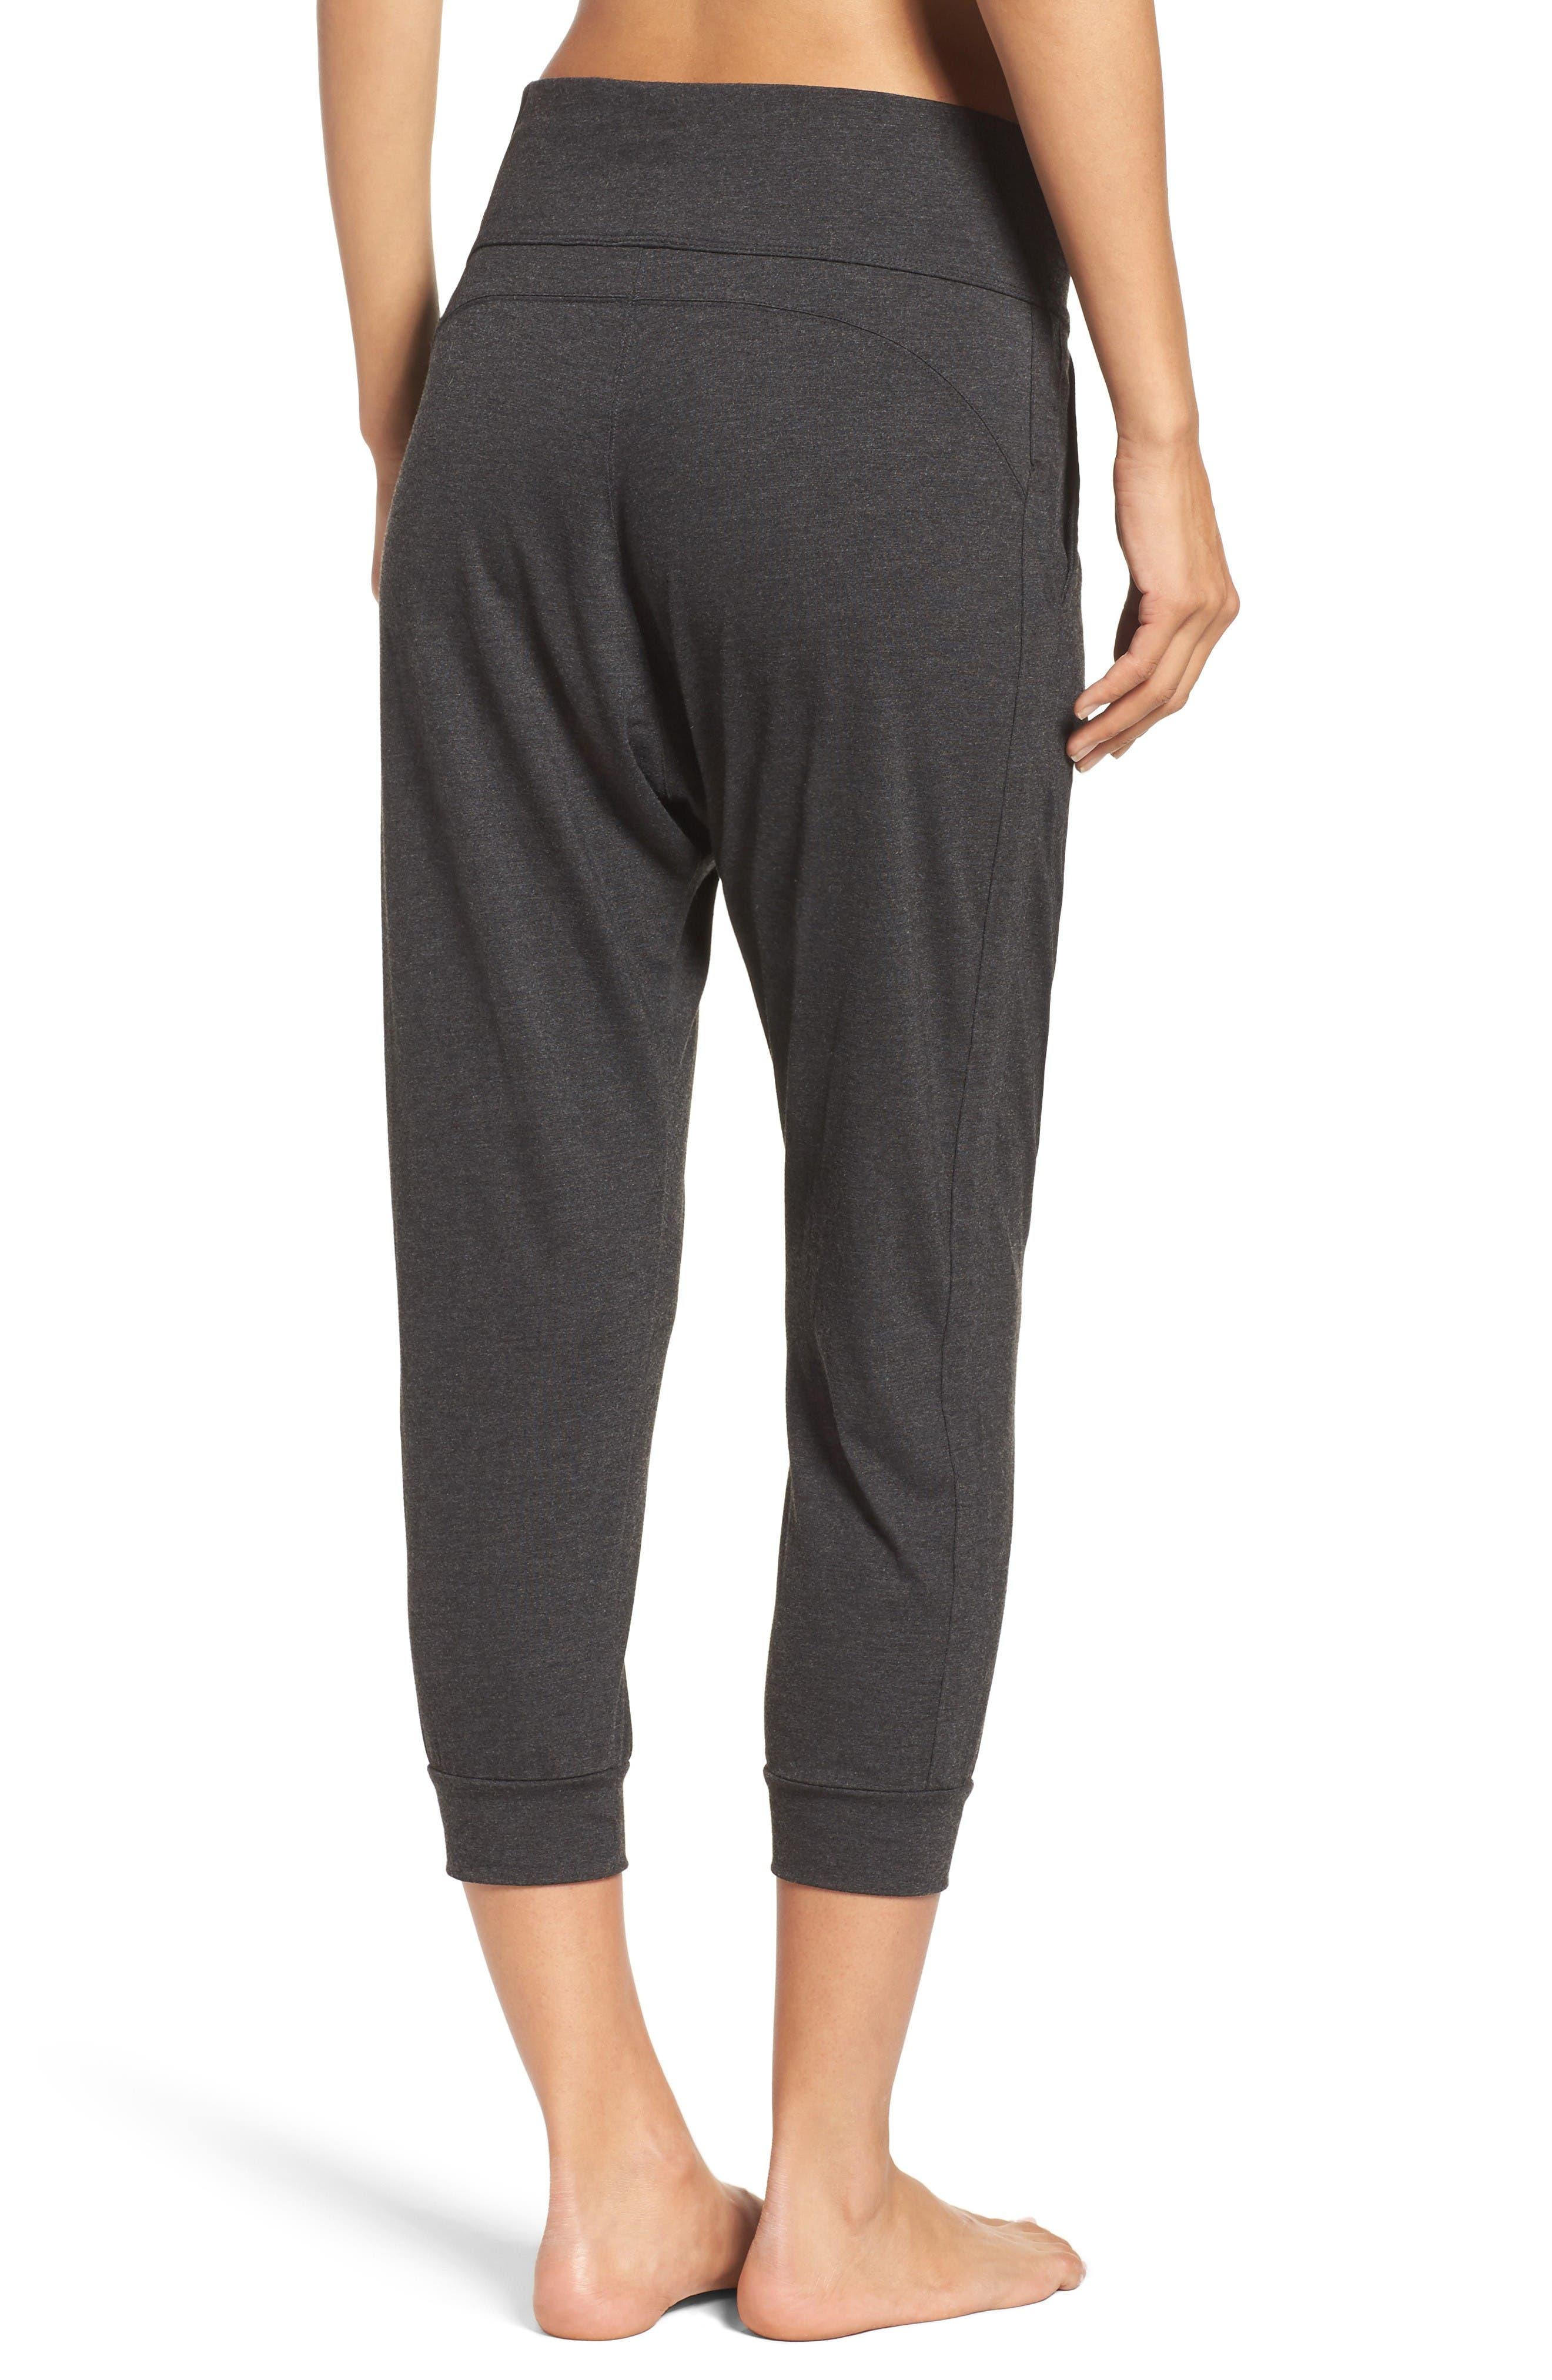 Harmony Crop Harem Pants,                             Alternate thumbnail 2, color,                             Grey Dark Charcoal Heather